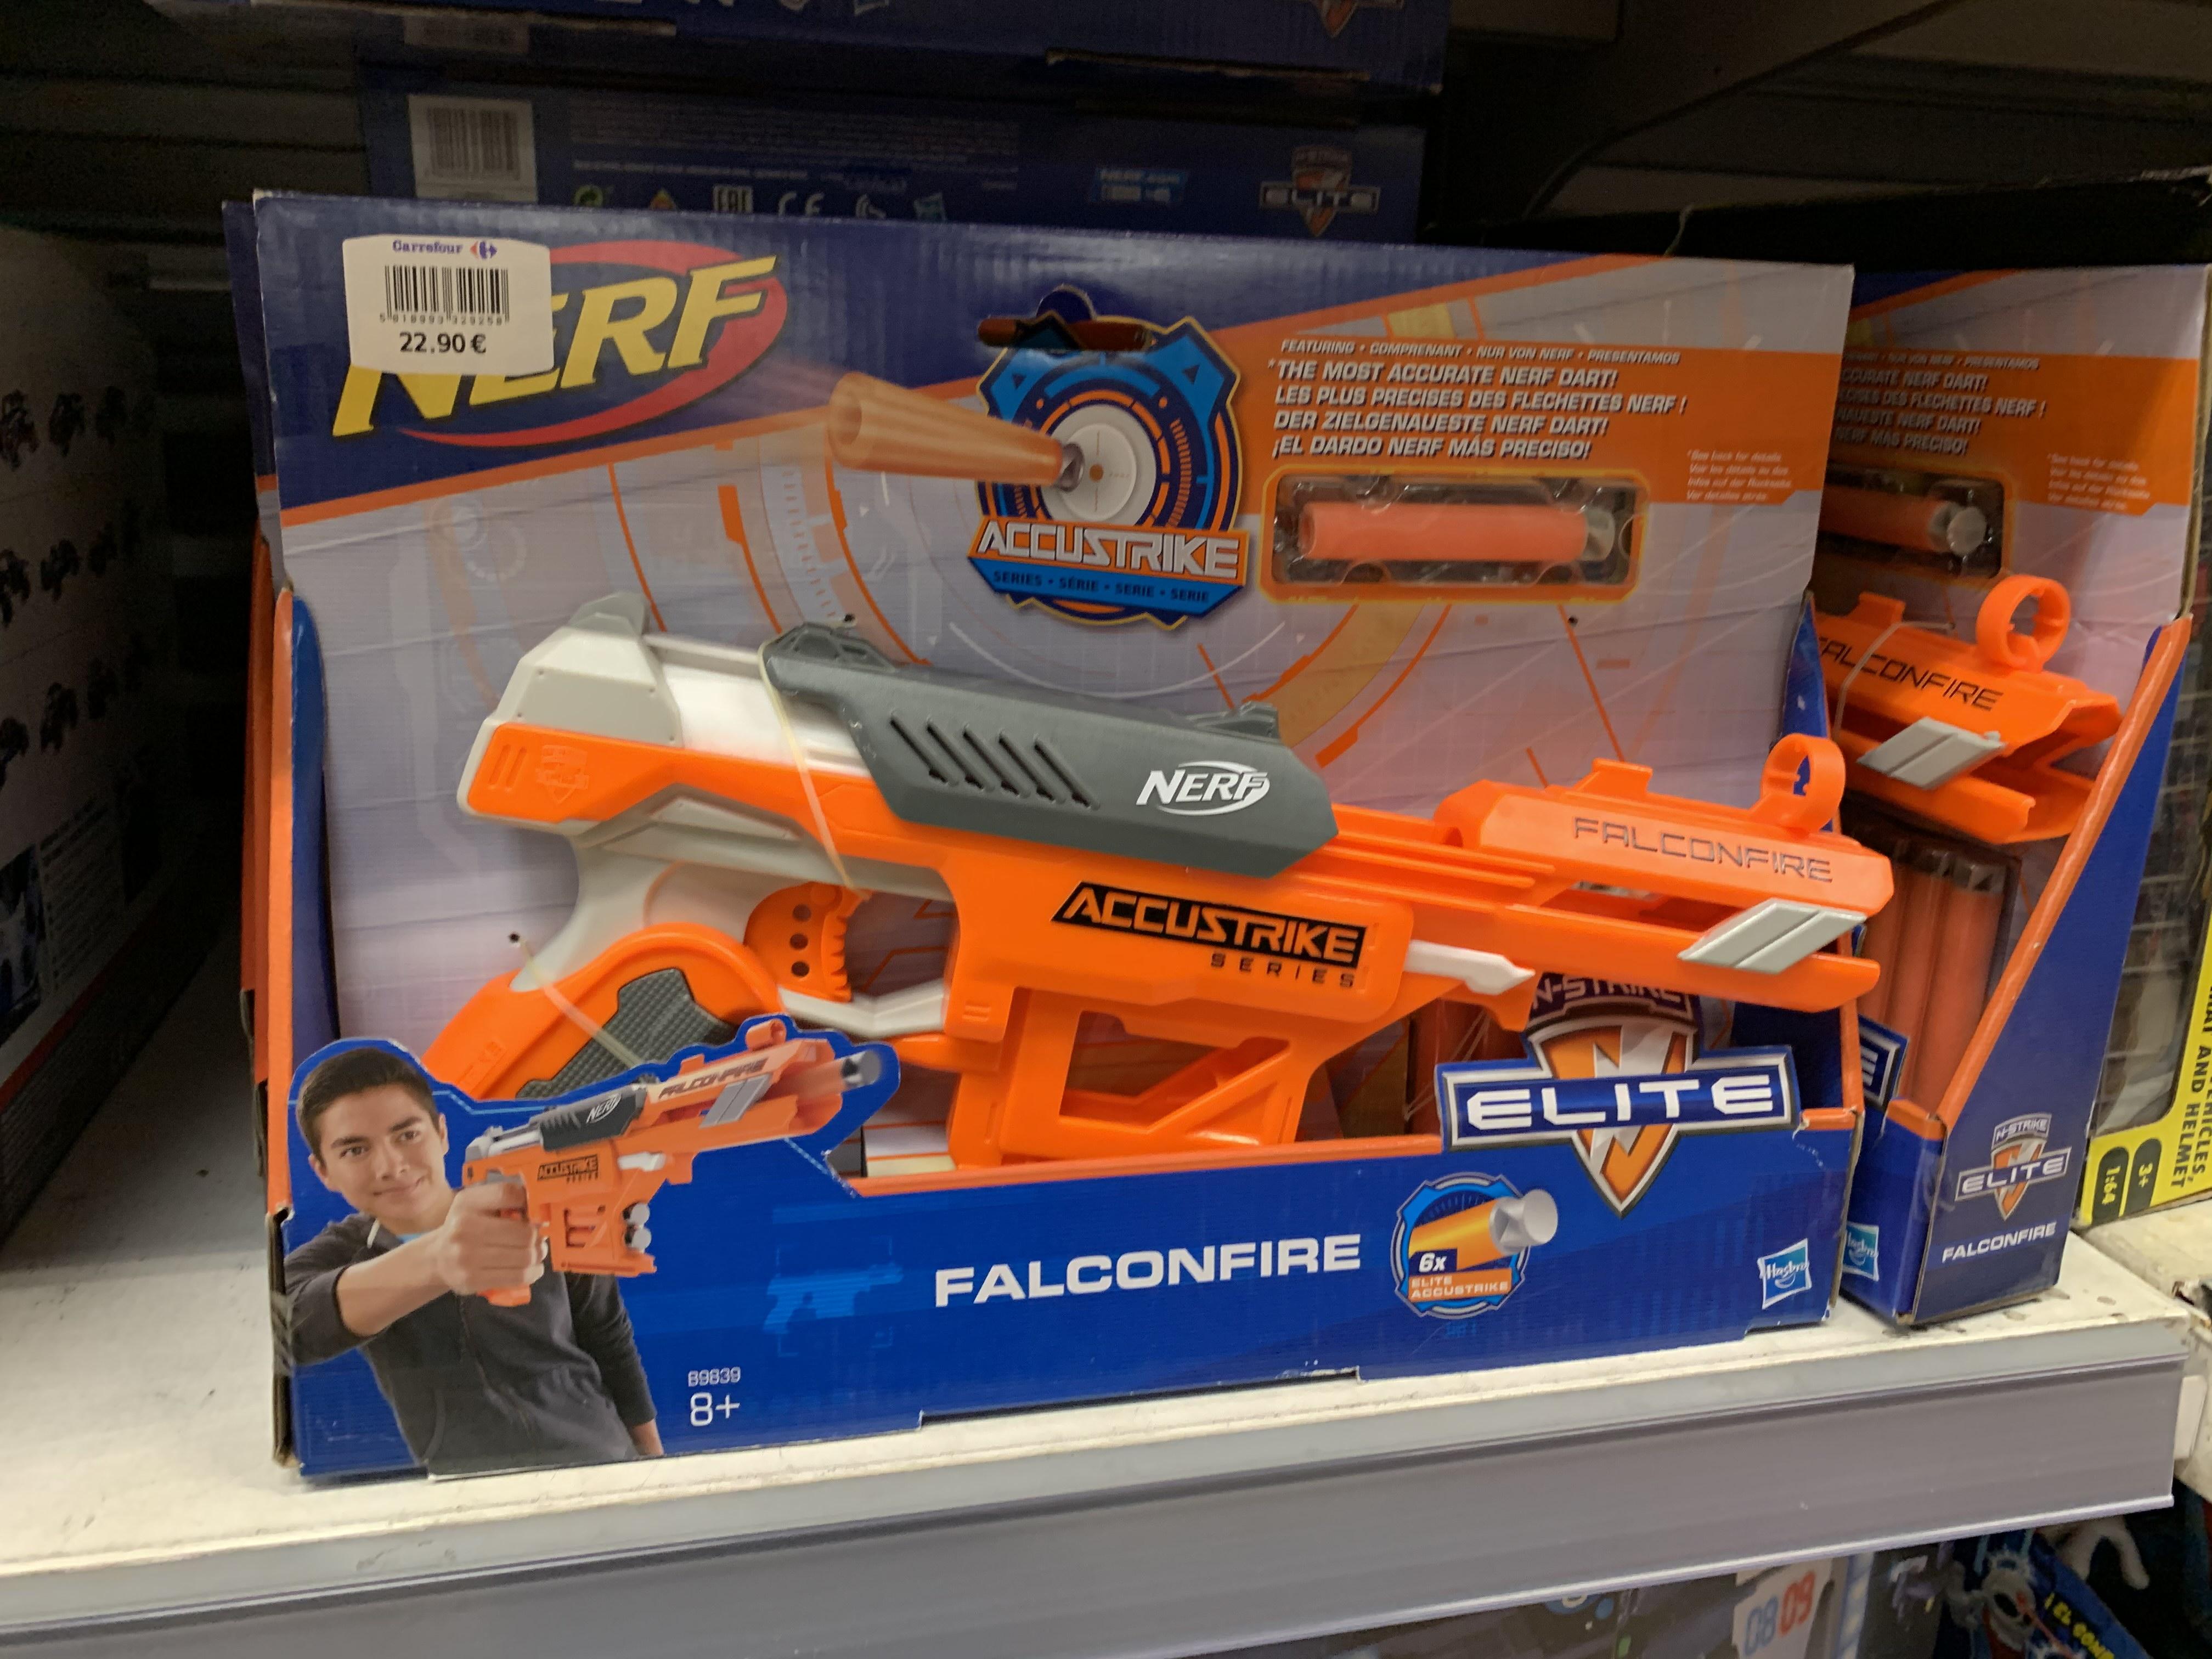 Pistola NERF Falconfire (Carrefour Murcia)